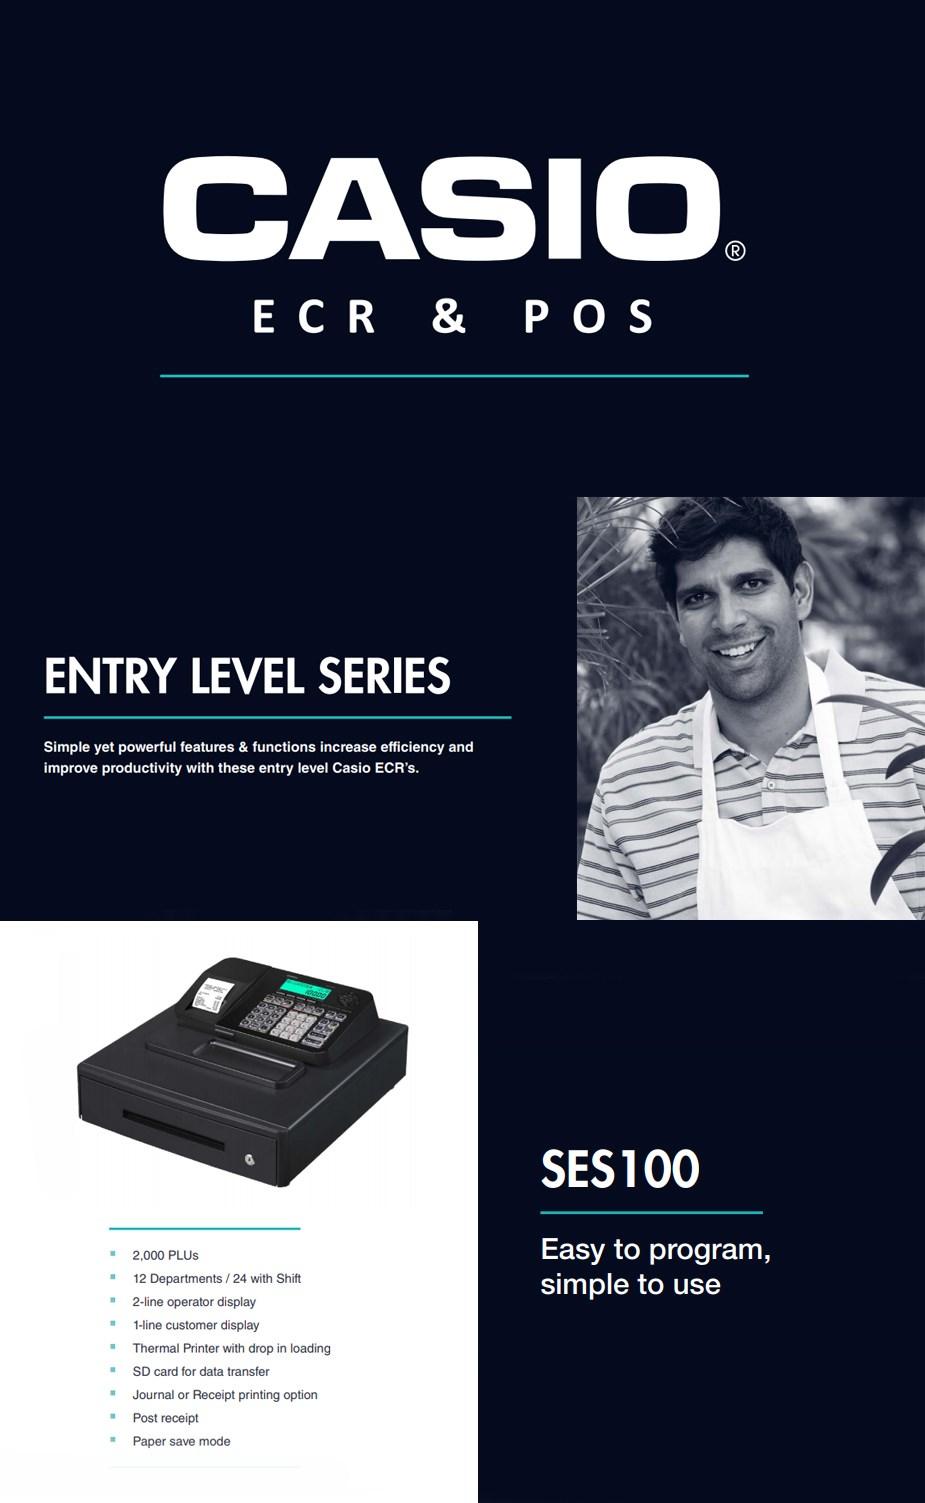 Casio SES100 Entry-Level Cash Register - Black - Desktop Overview 1